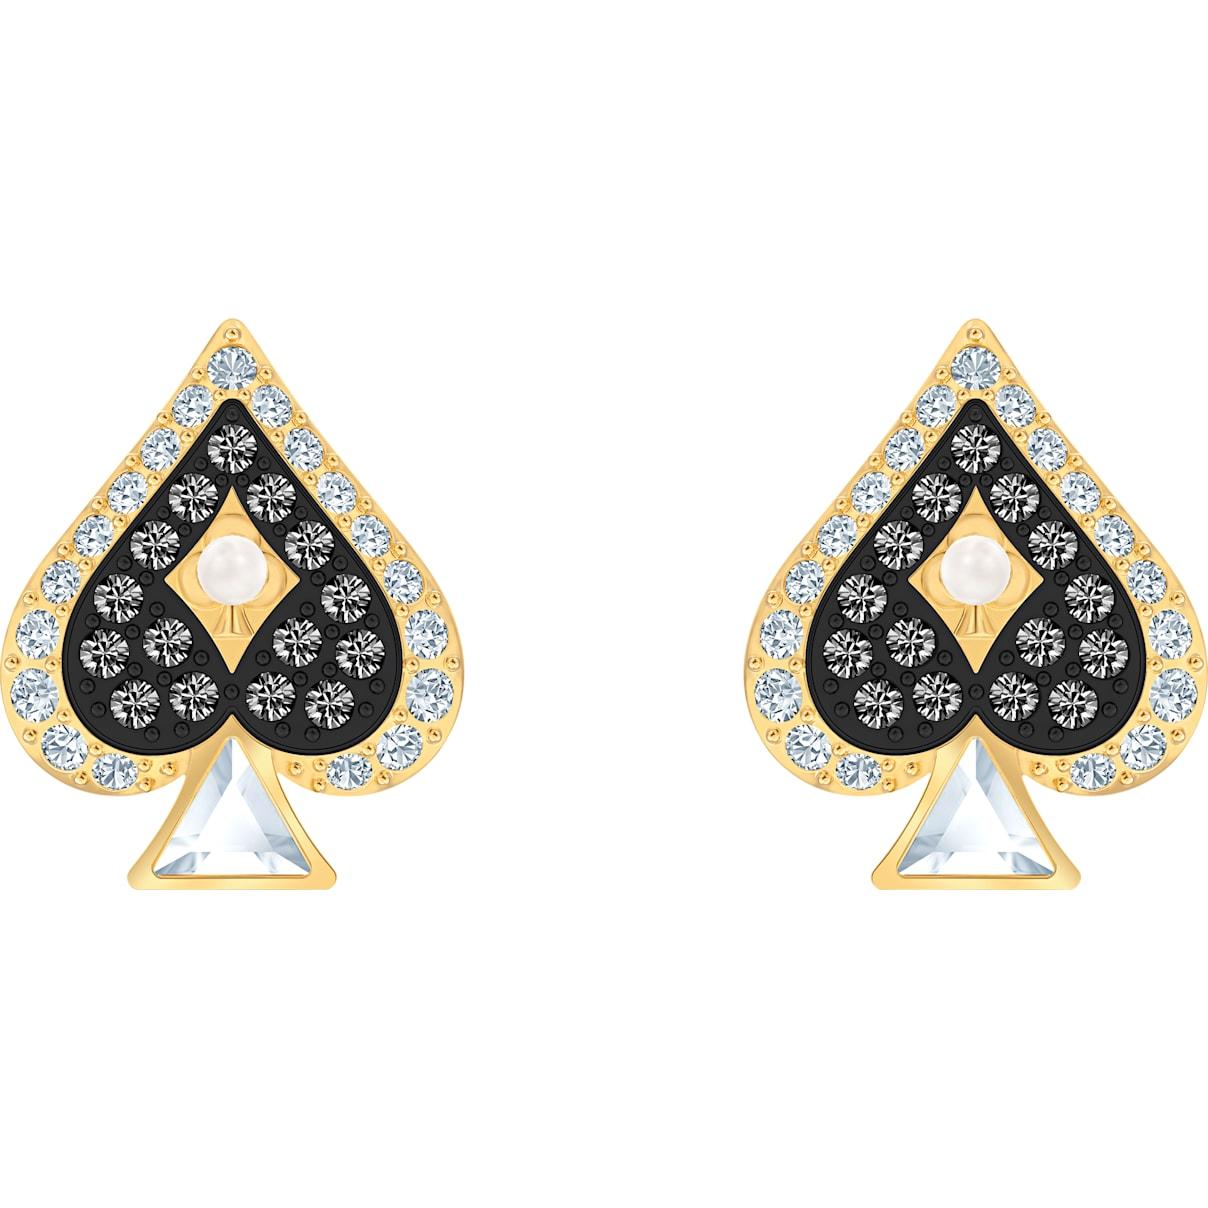 Swarovski Tarot Magic Stud Pierced Earrings, Multi-colored, Gold-tone plated